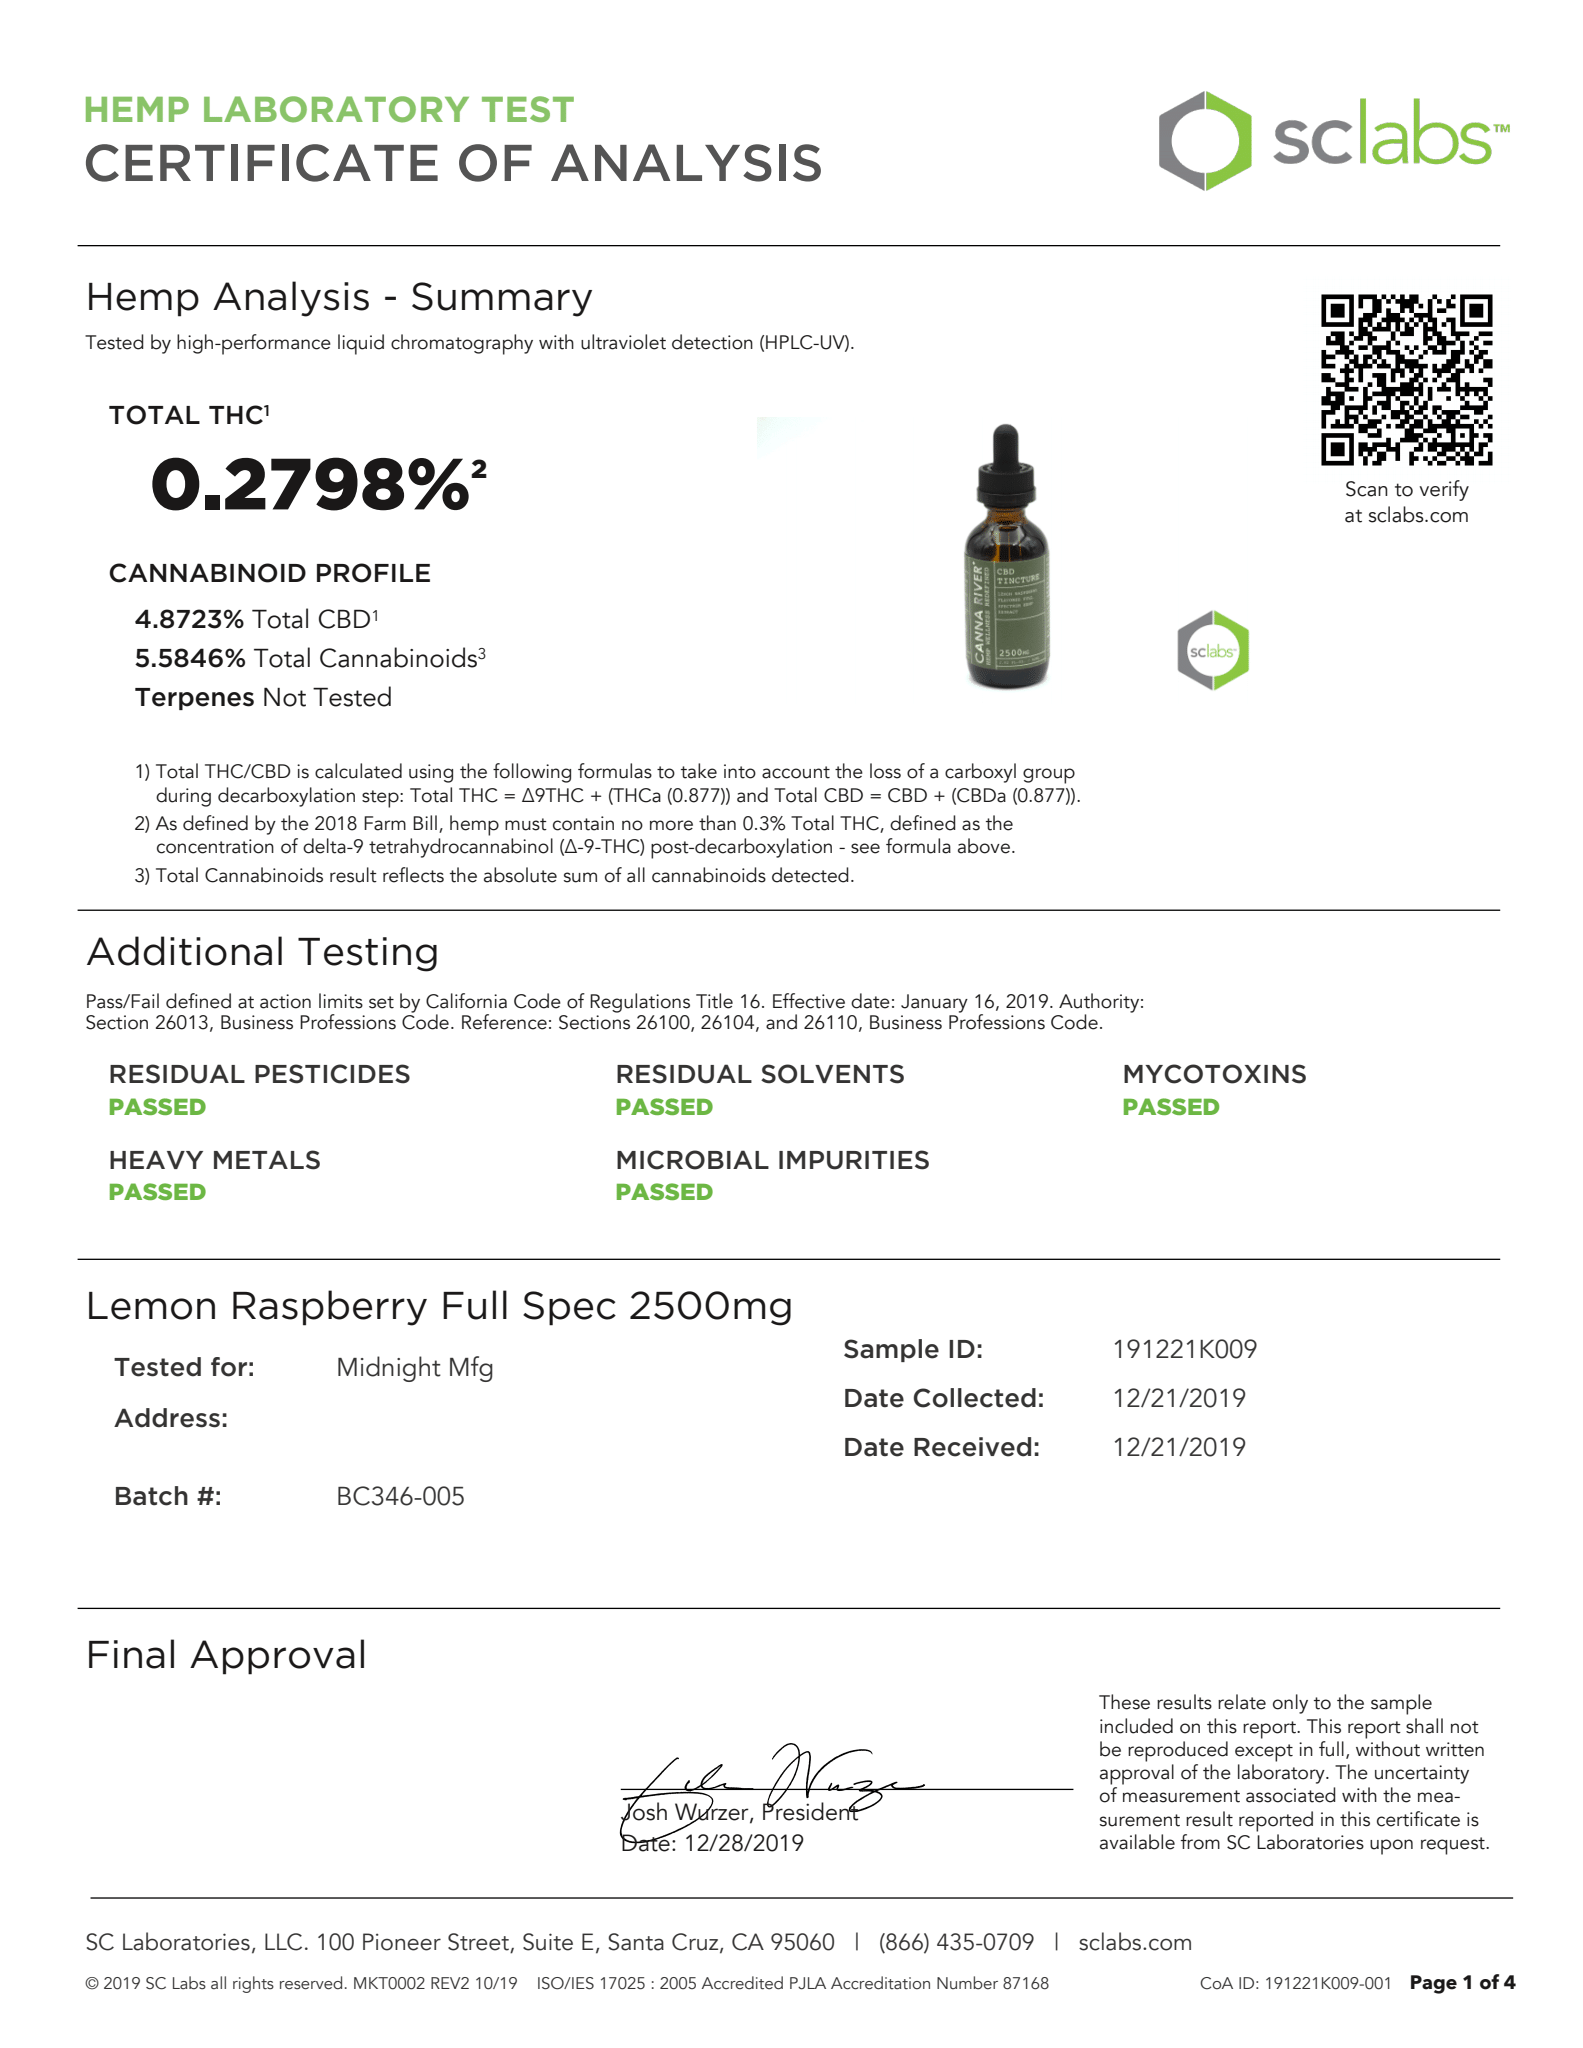 CANNA RIVER CBD Tincture Lab Report Full Spectrum Lemon Raspberry 2500mg